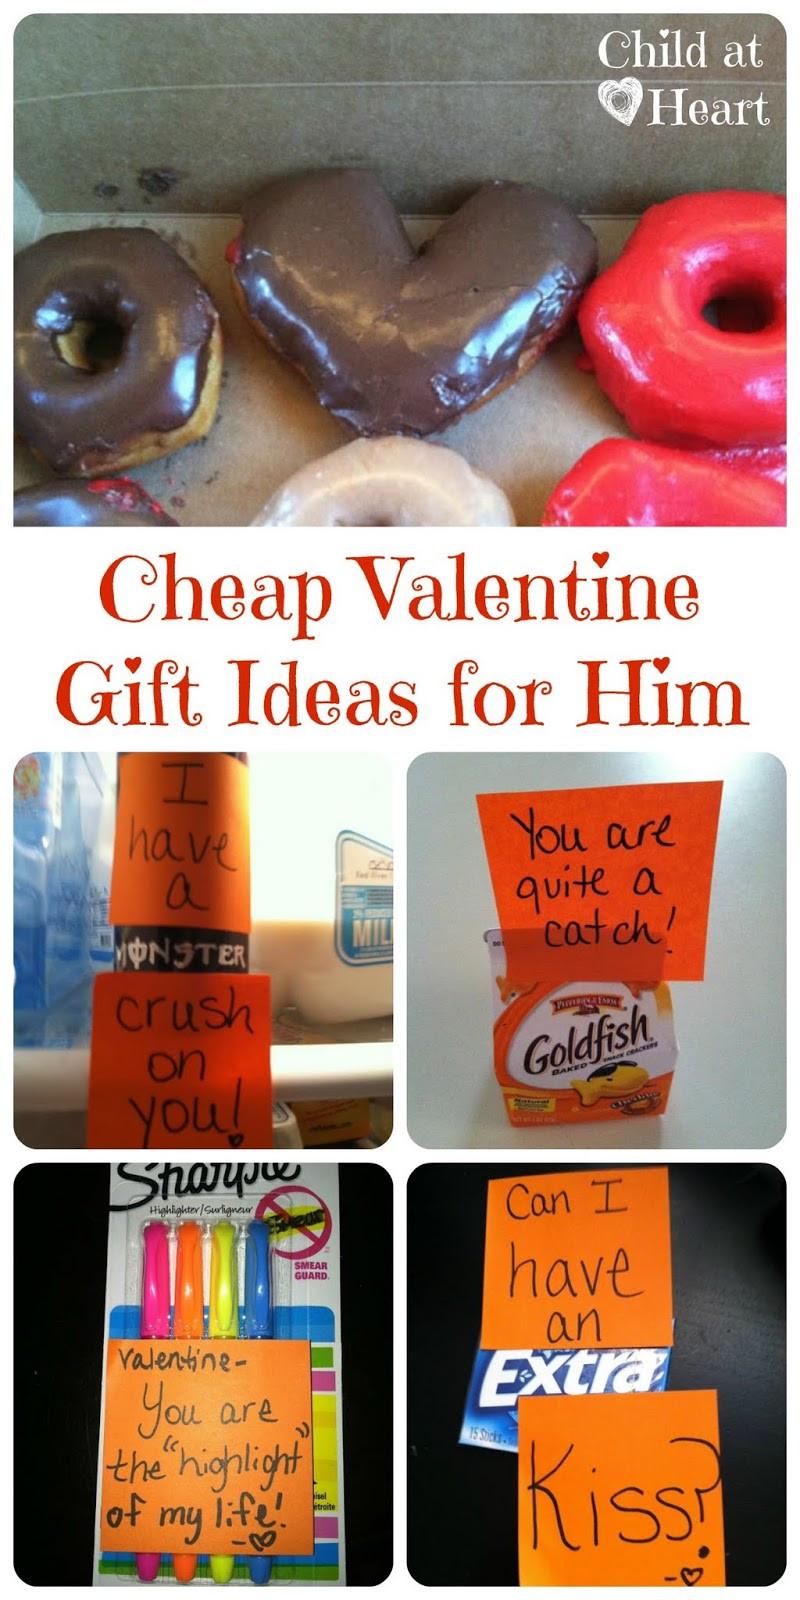 Valentines Gift Ideas For Him  Cheap Valentine Gift Ideas for Him Child at Heart Blog